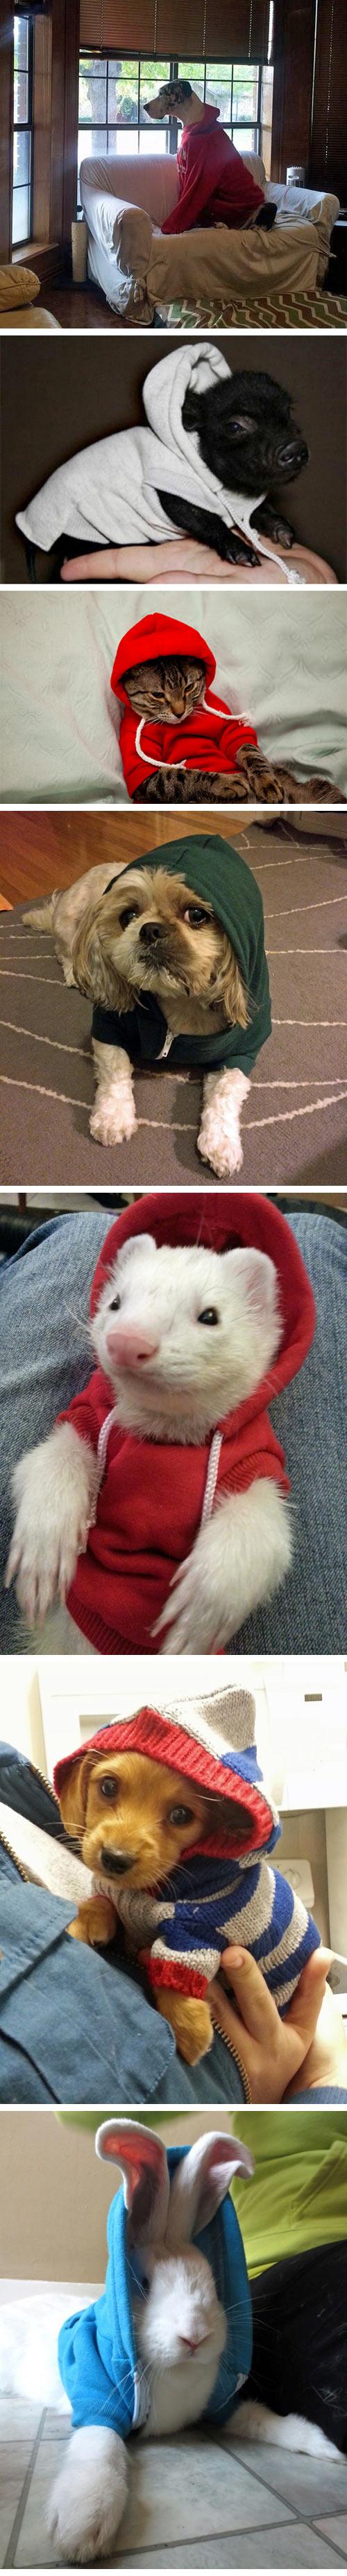 funny-animals-wearing-hoodies-dog-pig